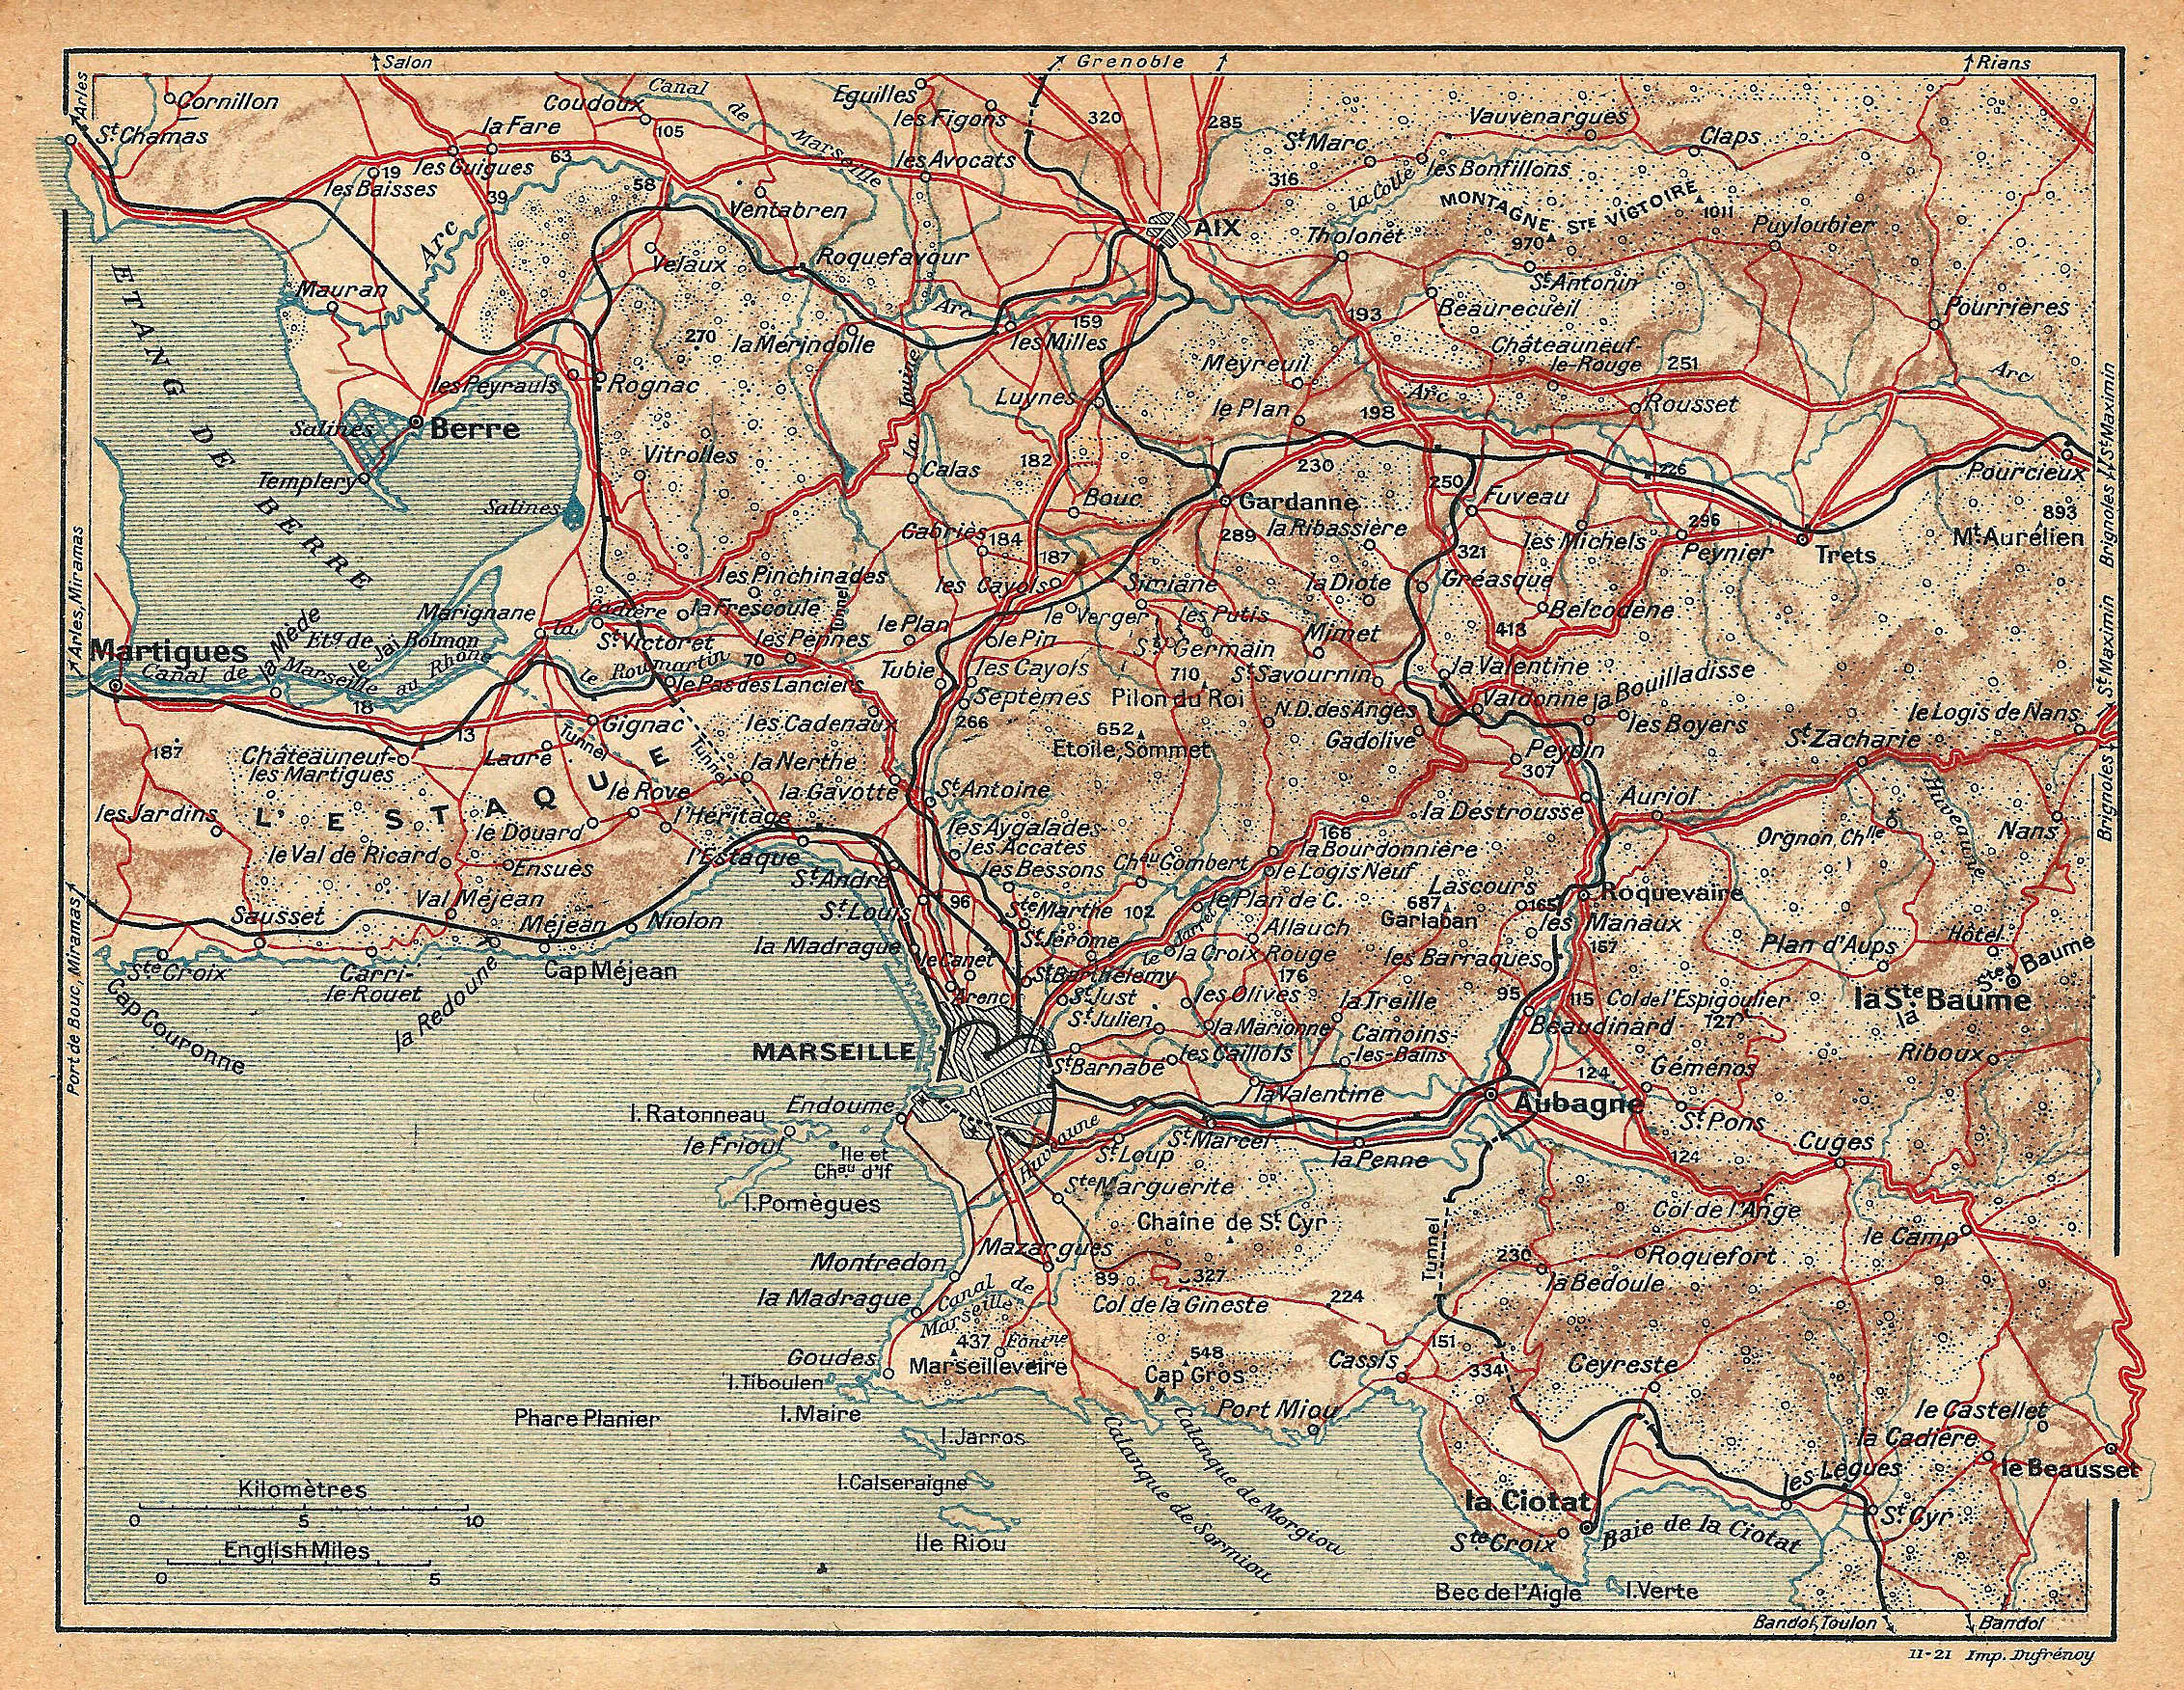 carte marseille et environs File:Marseille environs 1921 Carte 25.   Wikimedia Commons